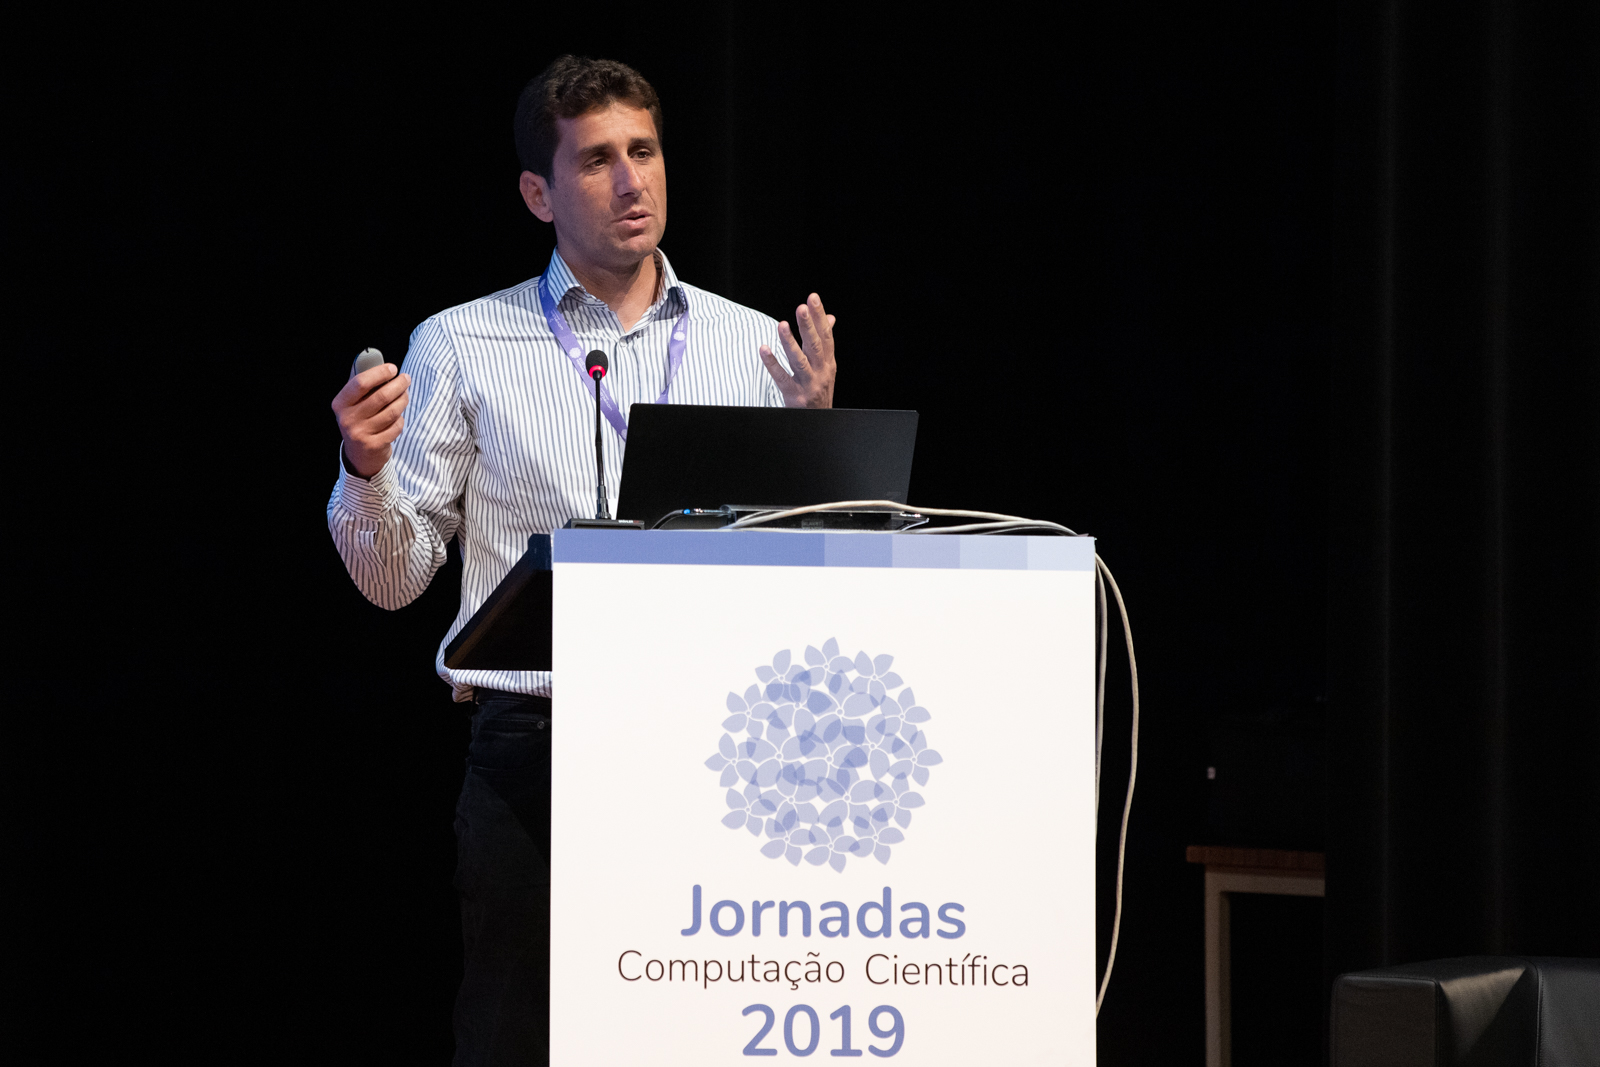 Jornadas 2019 Daniel Gomes Zapping